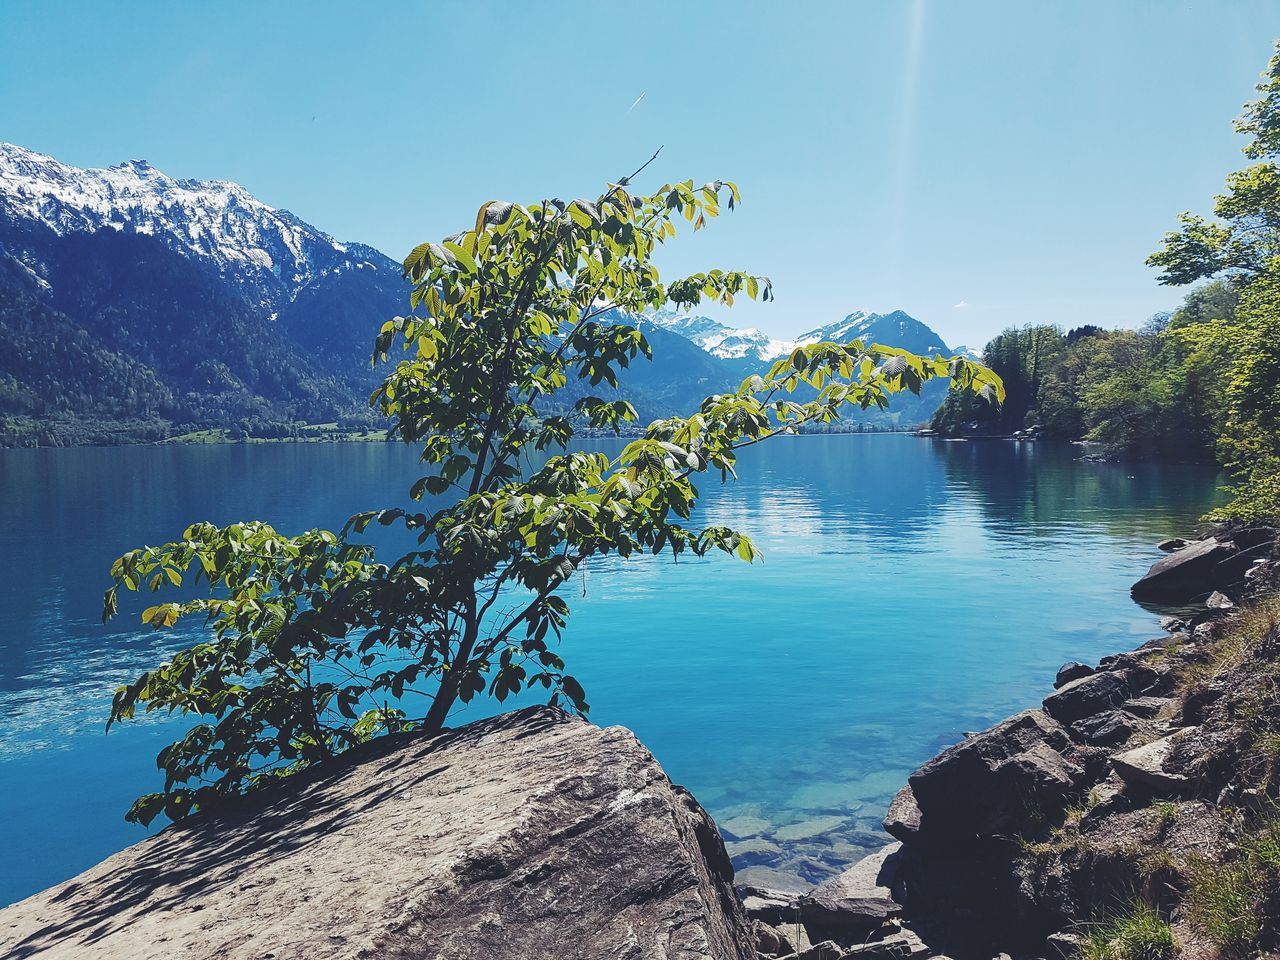 water, mountain, beauty in nature, scenics - nature, sky, tranquil scene, nature, tranquility, day, tree, lake, plant, no people, sunlight, non-urban scene, idyllic, blue, outdoors, mountain range, mountain peak